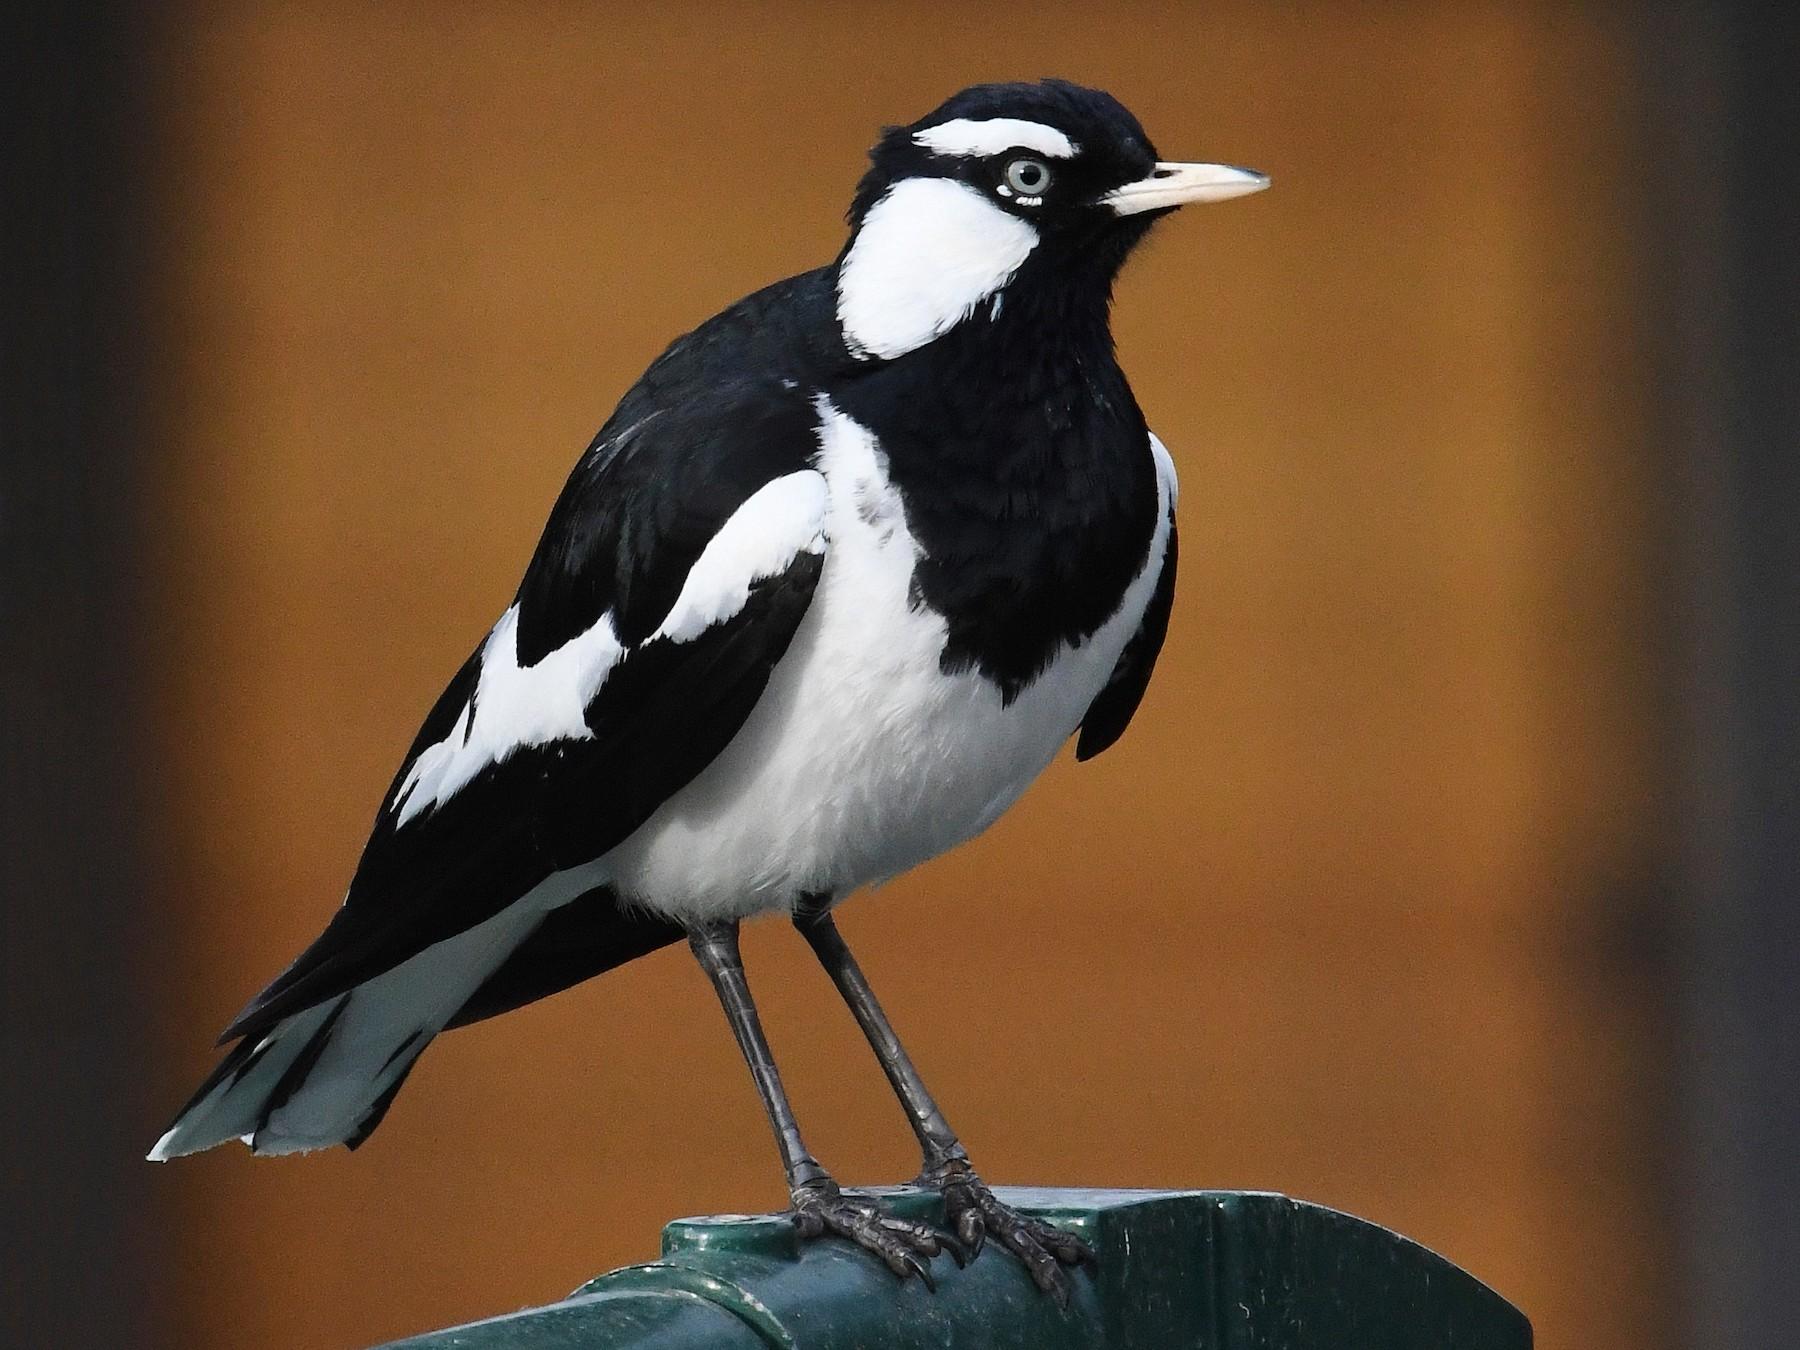 Magpie-lark - Terence Alexander